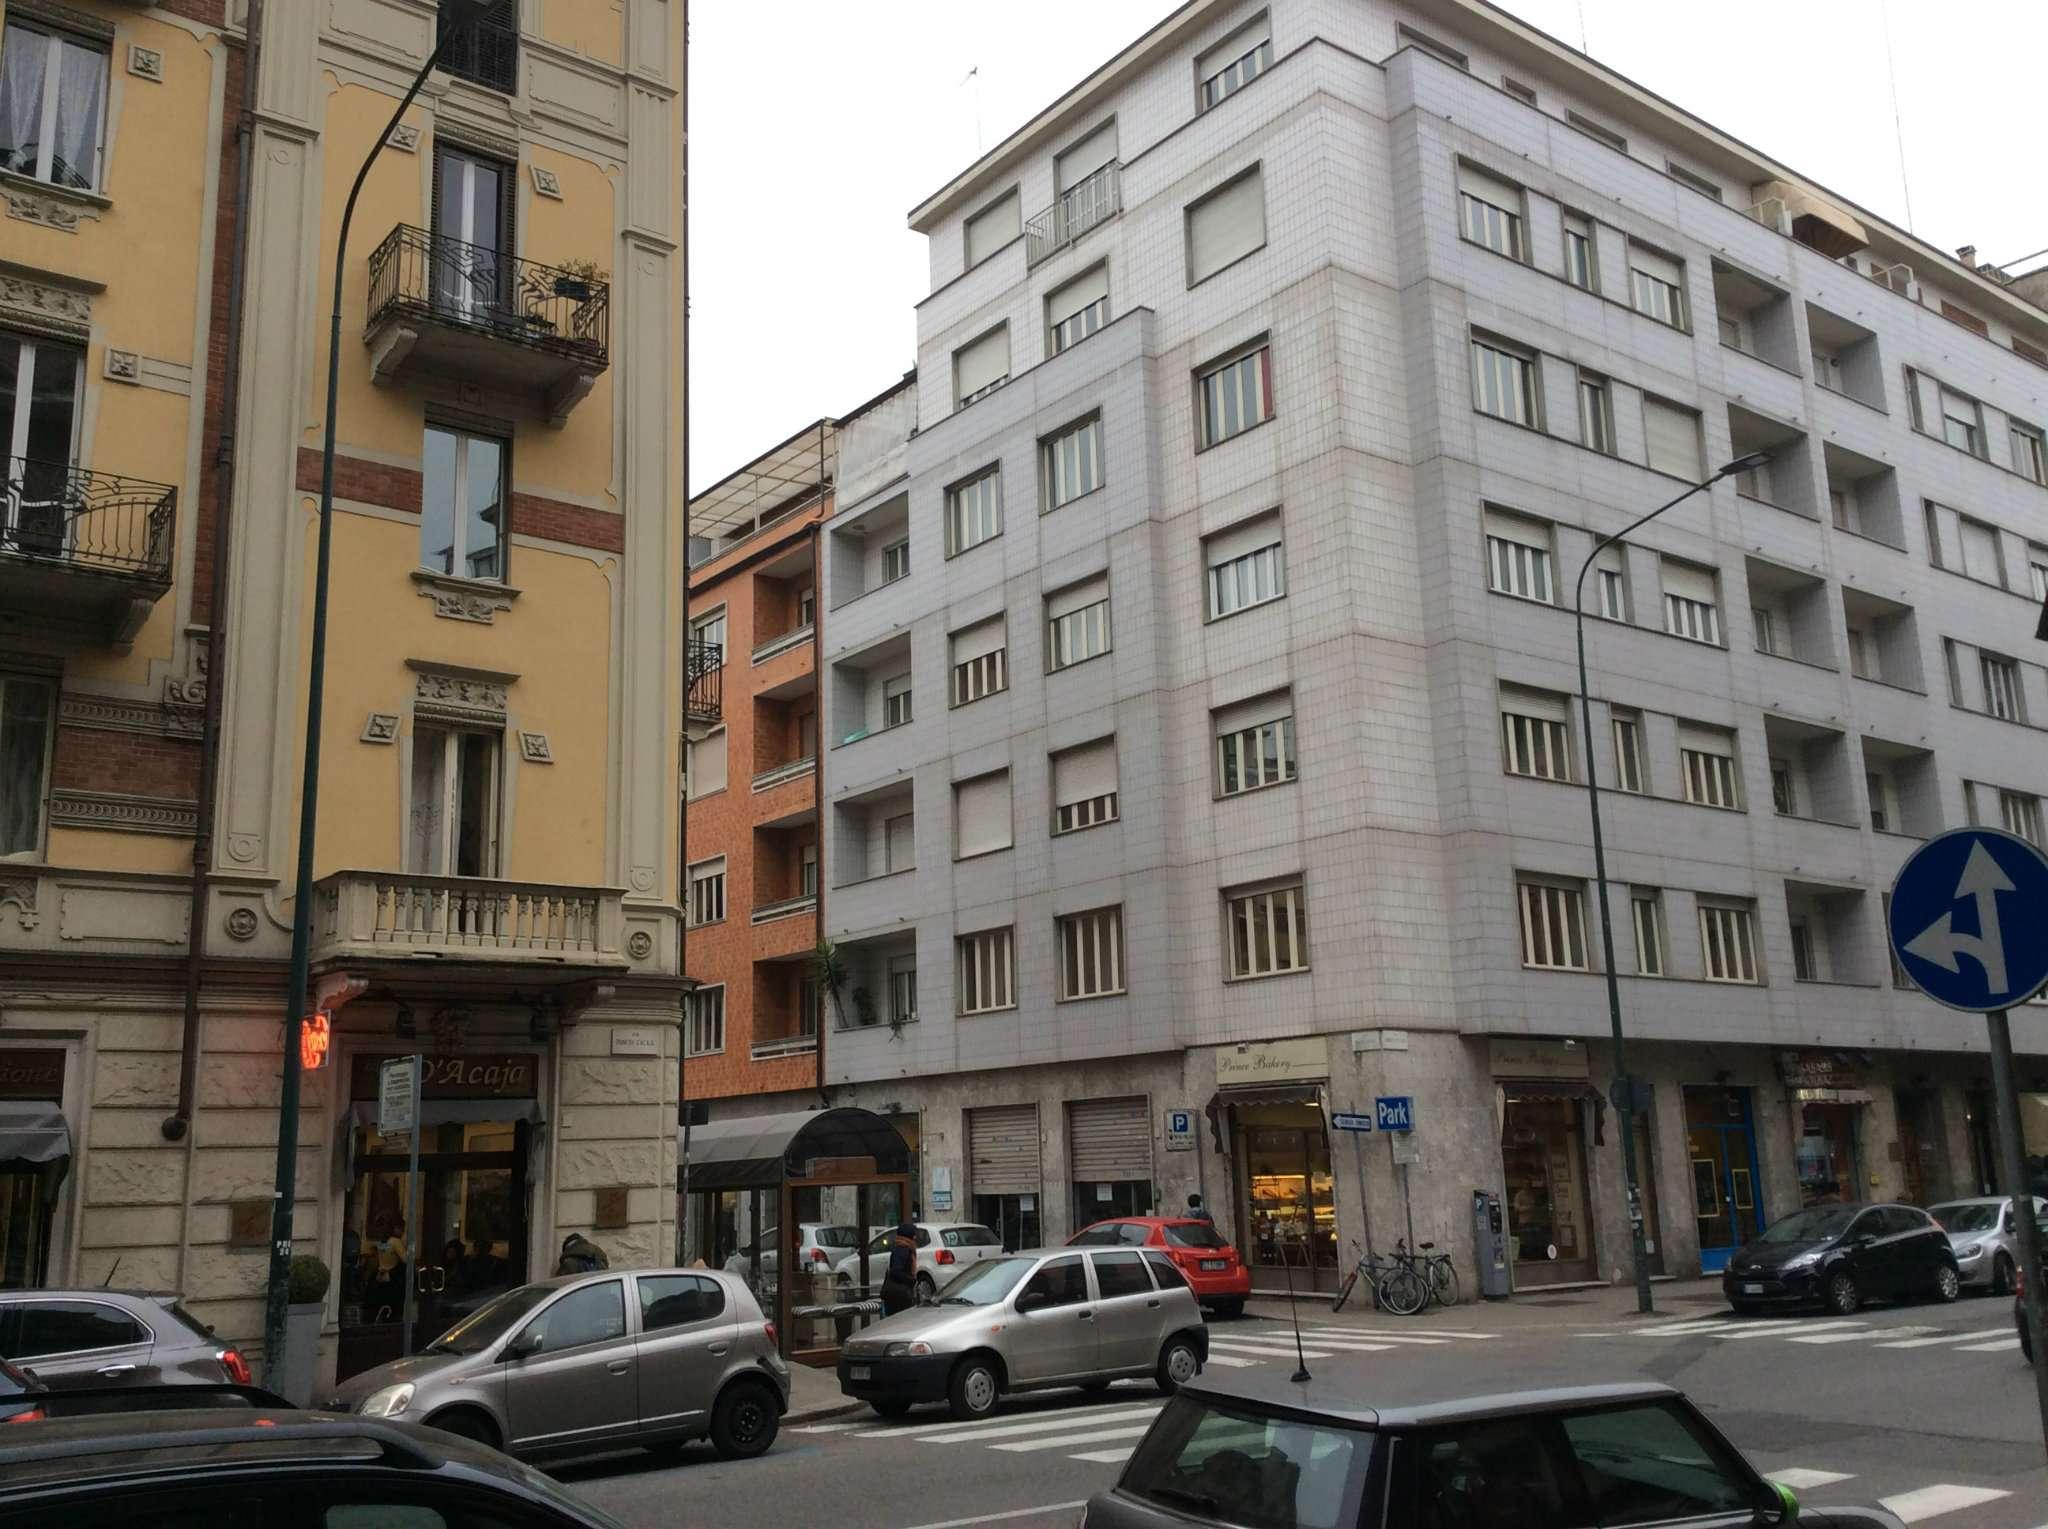 Vendita - Negozio - Torino - DUE VETRINE